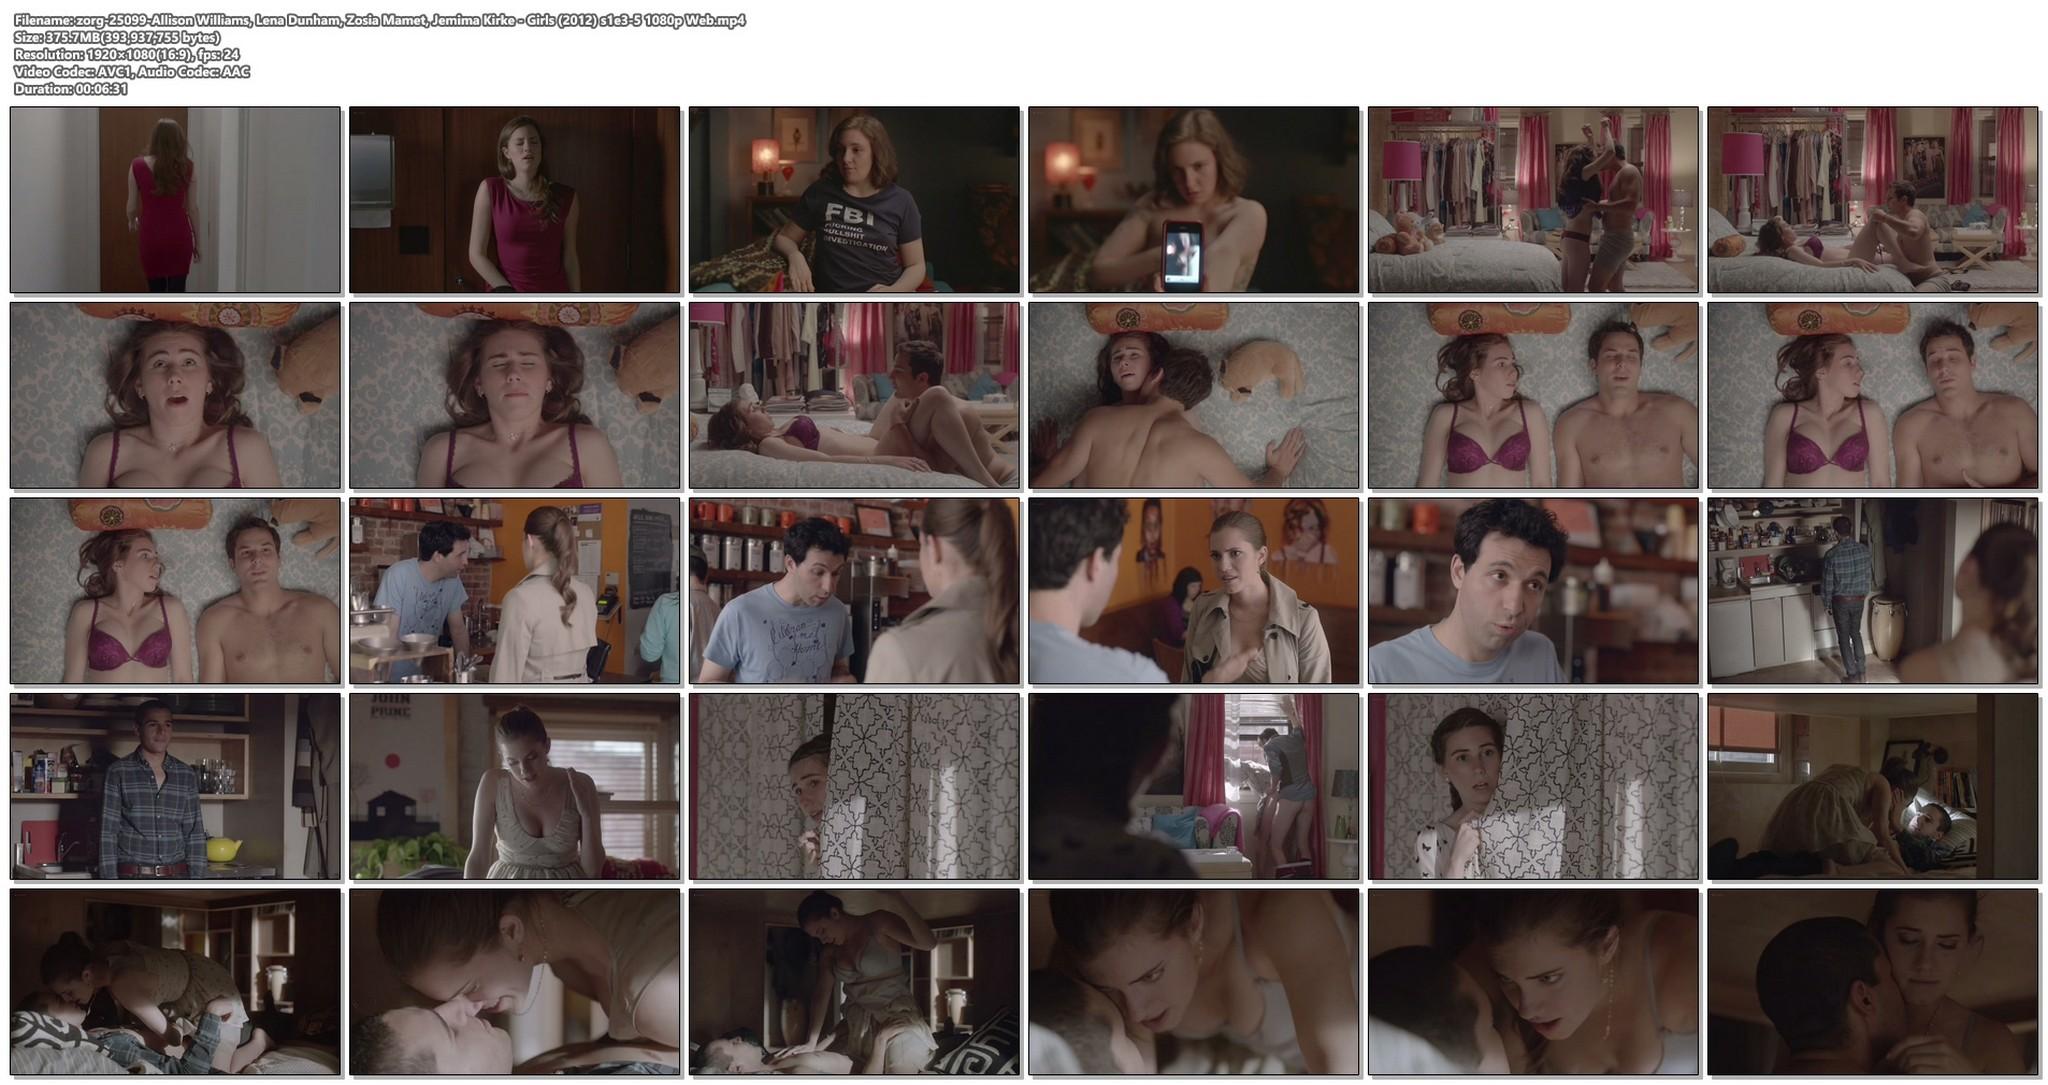 Allison Williams sex Lena Dunham nude Zosia Mamet Jemima Kirke sex Girls 2012 s1e3 5 1080p Web 19